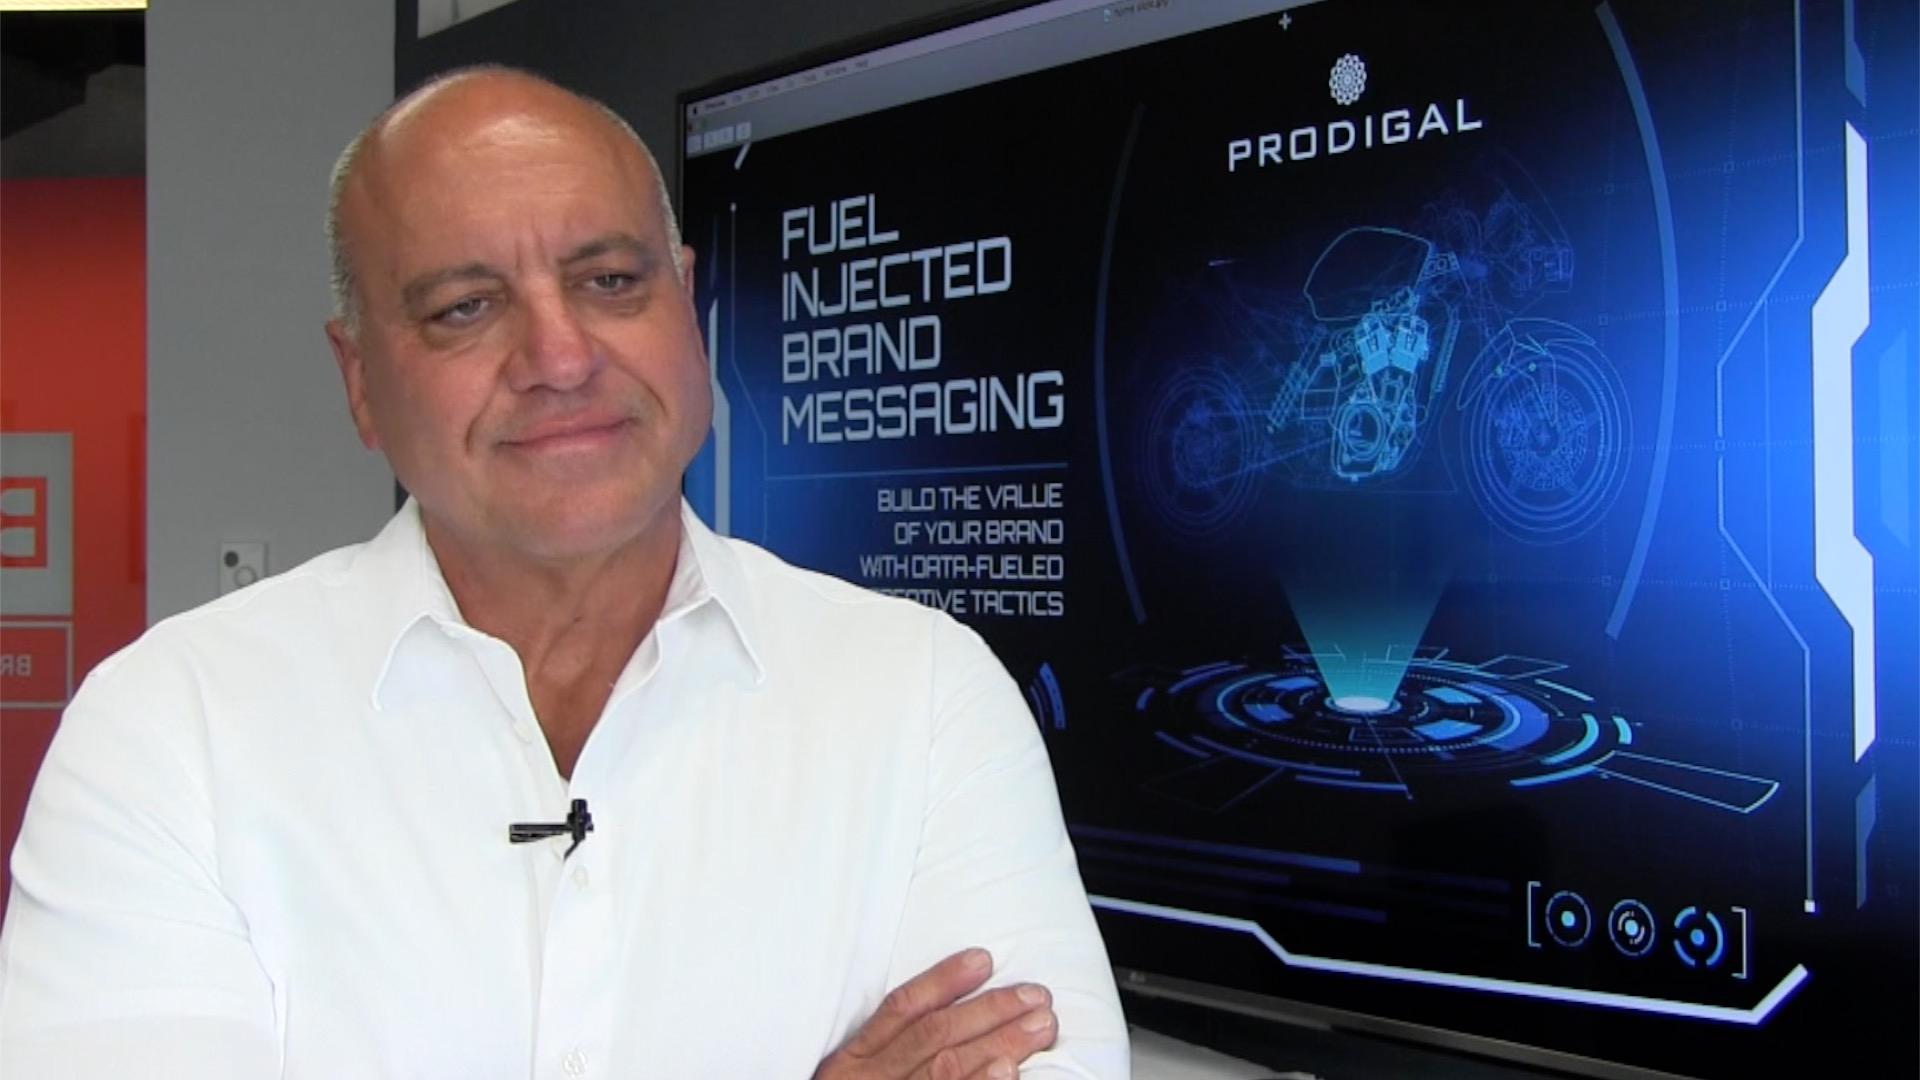 Jeff Hedrich, The Prodigal Co.